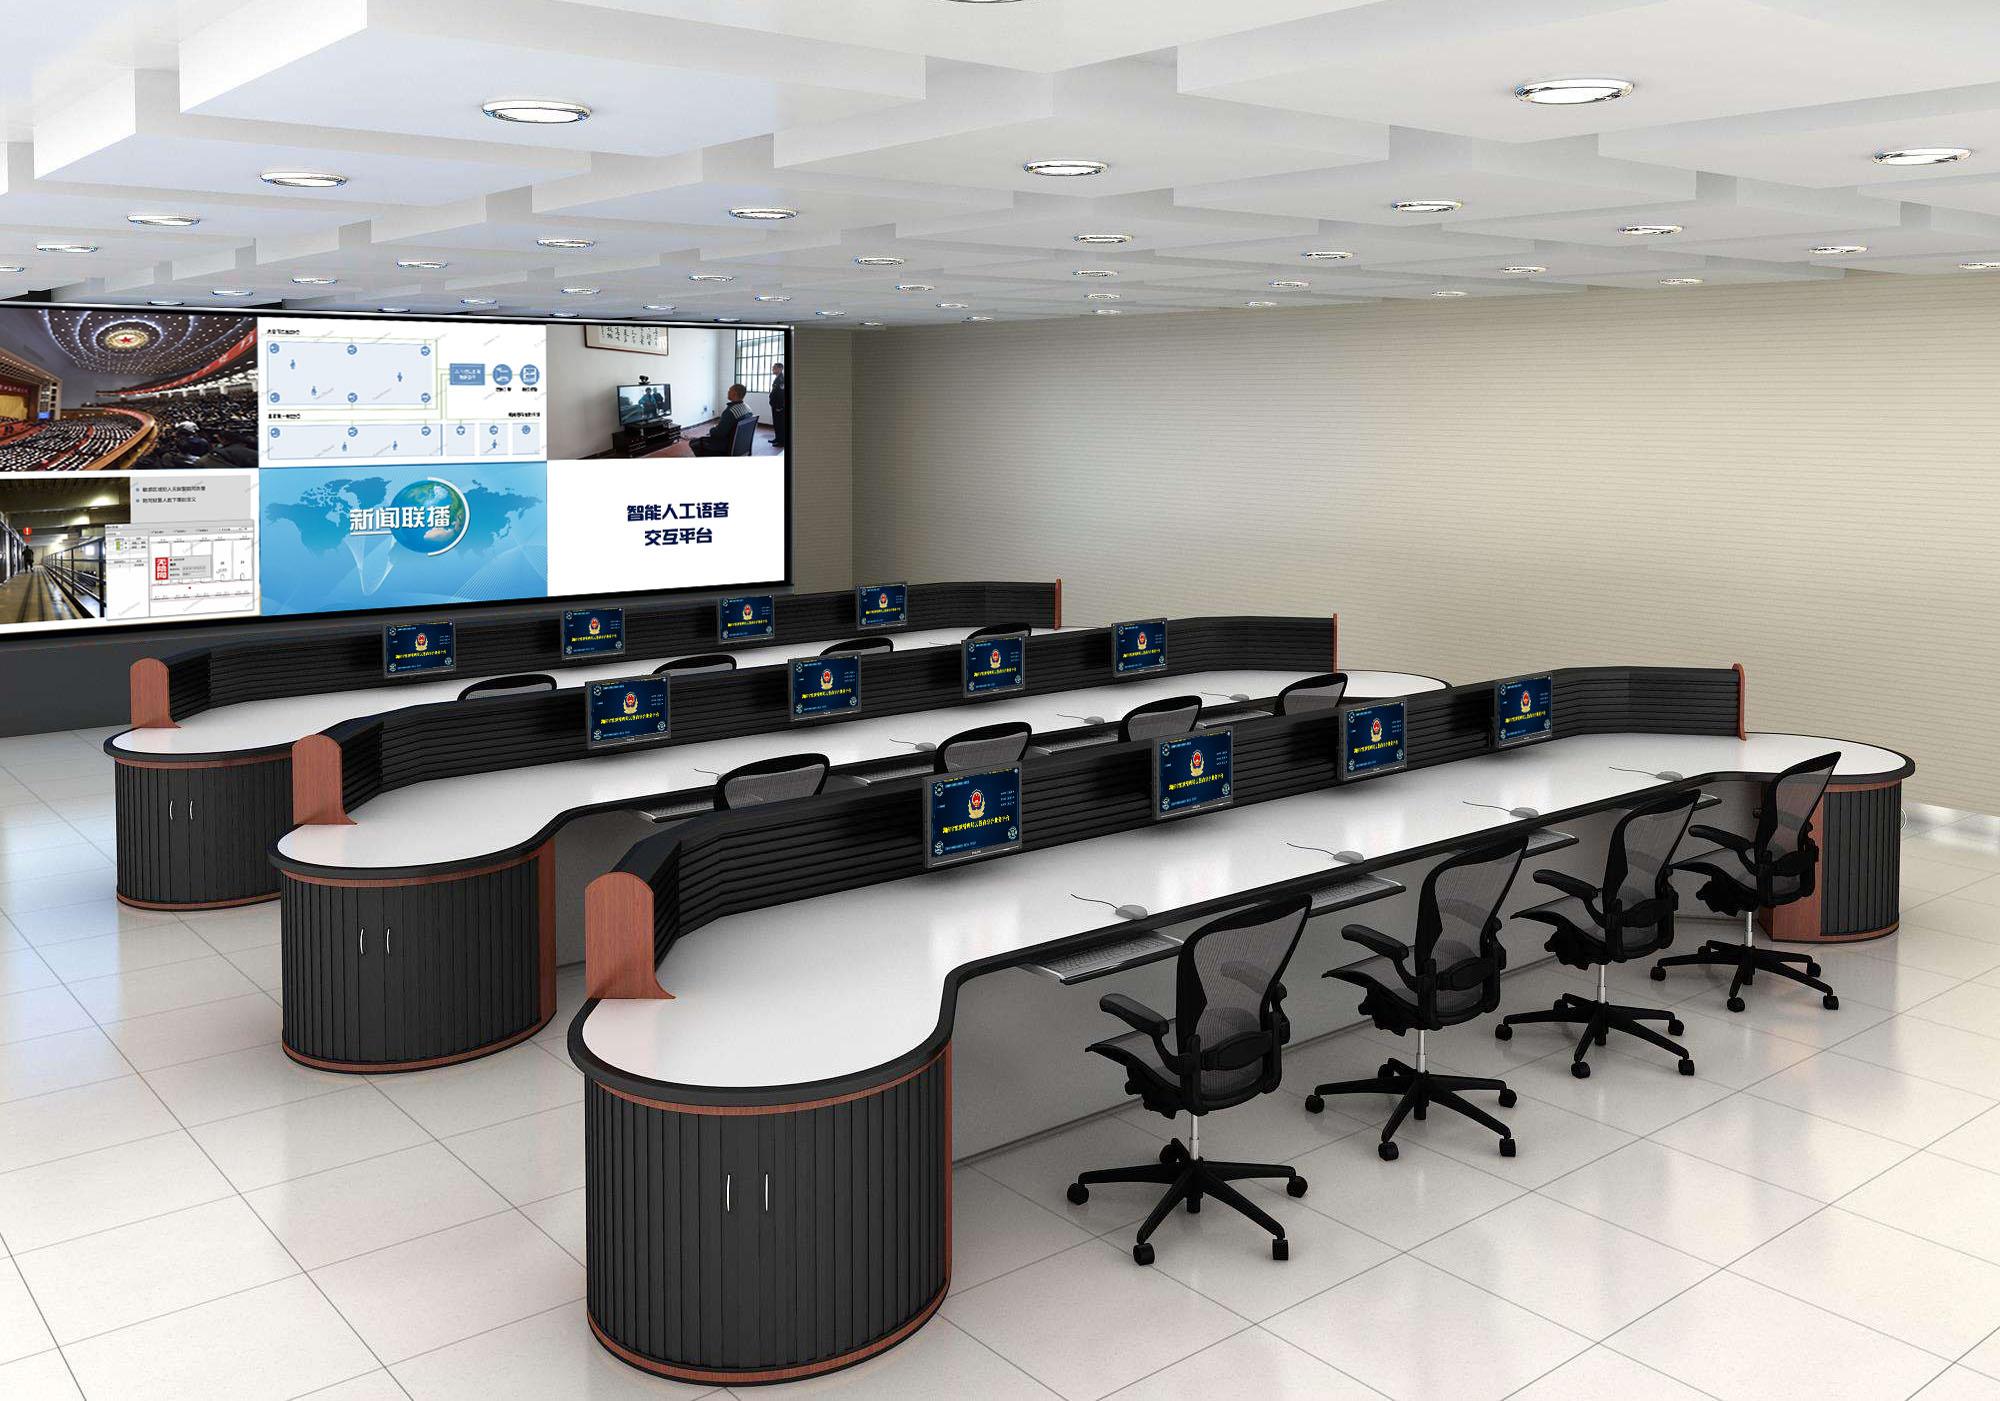 IPTV|监狱电化系统|监狱IPTV|监狱电视系统|监狱电教系统